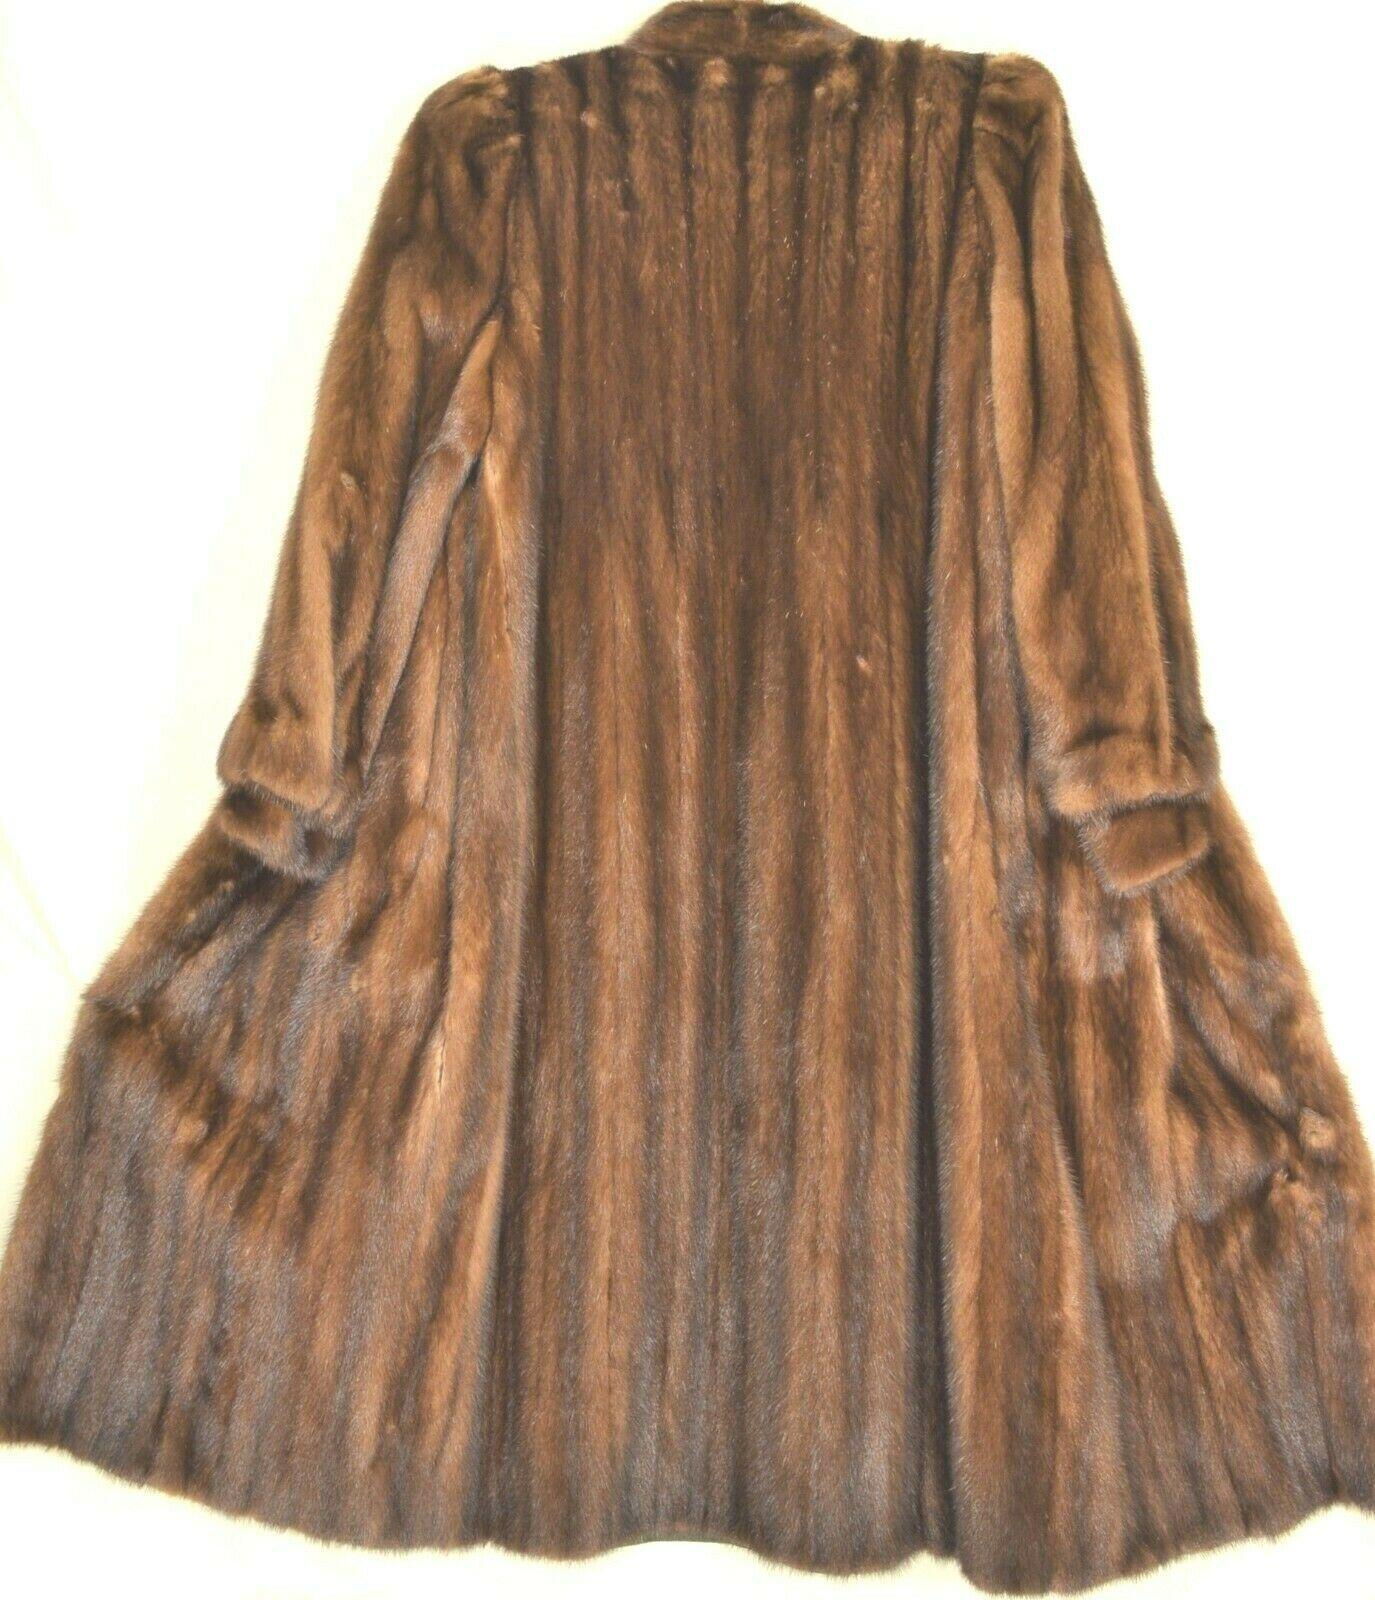 France Olivia fur mink coat FR 44 full length mahogany chic sophisticate brown